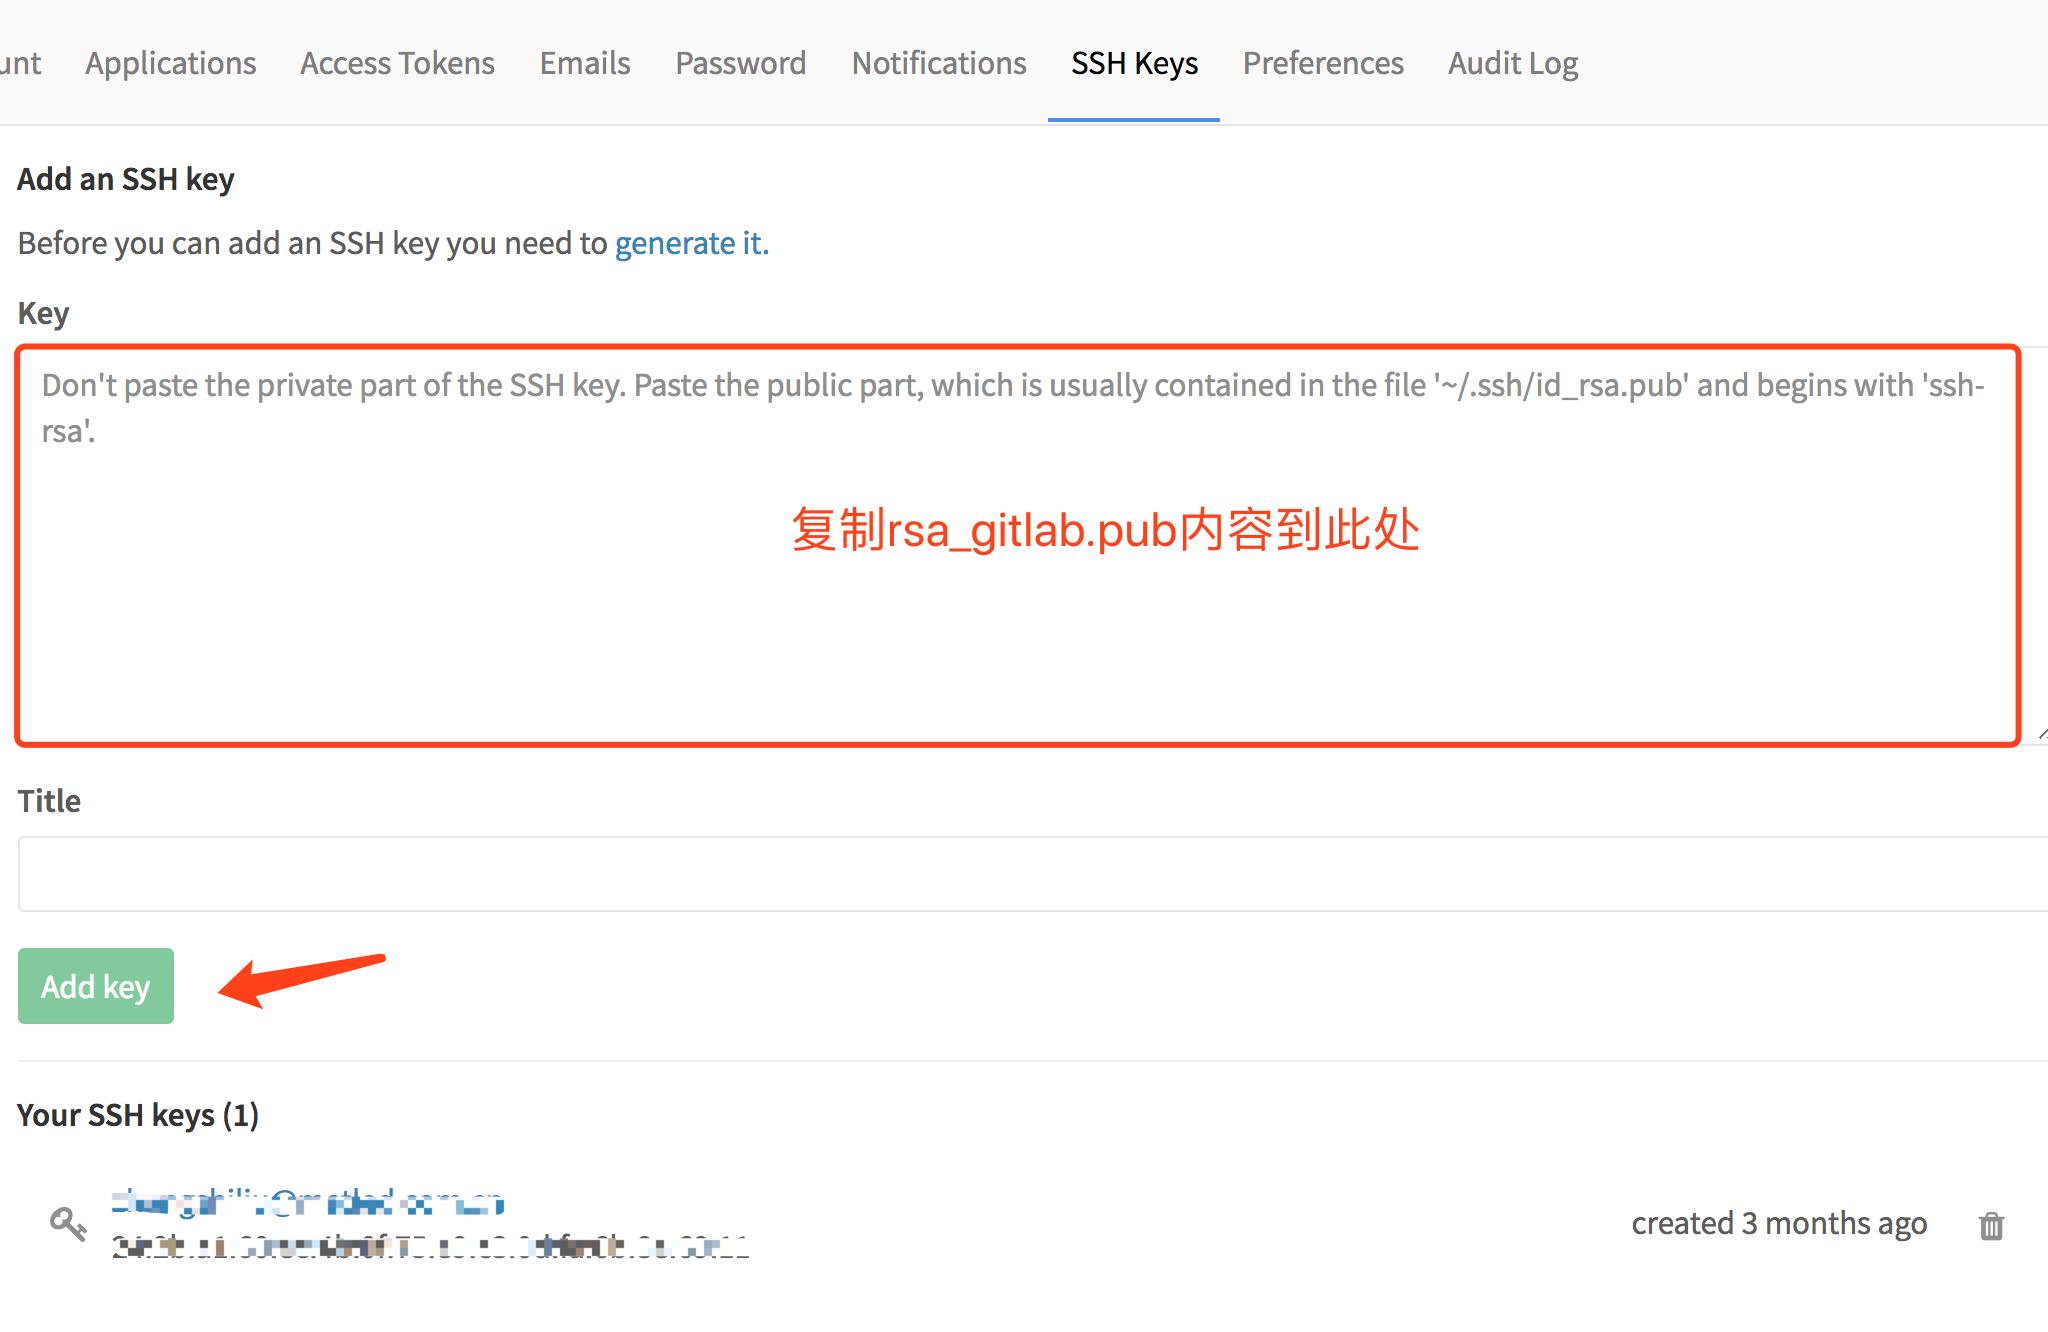 github.com-add-new-ssh-key-2